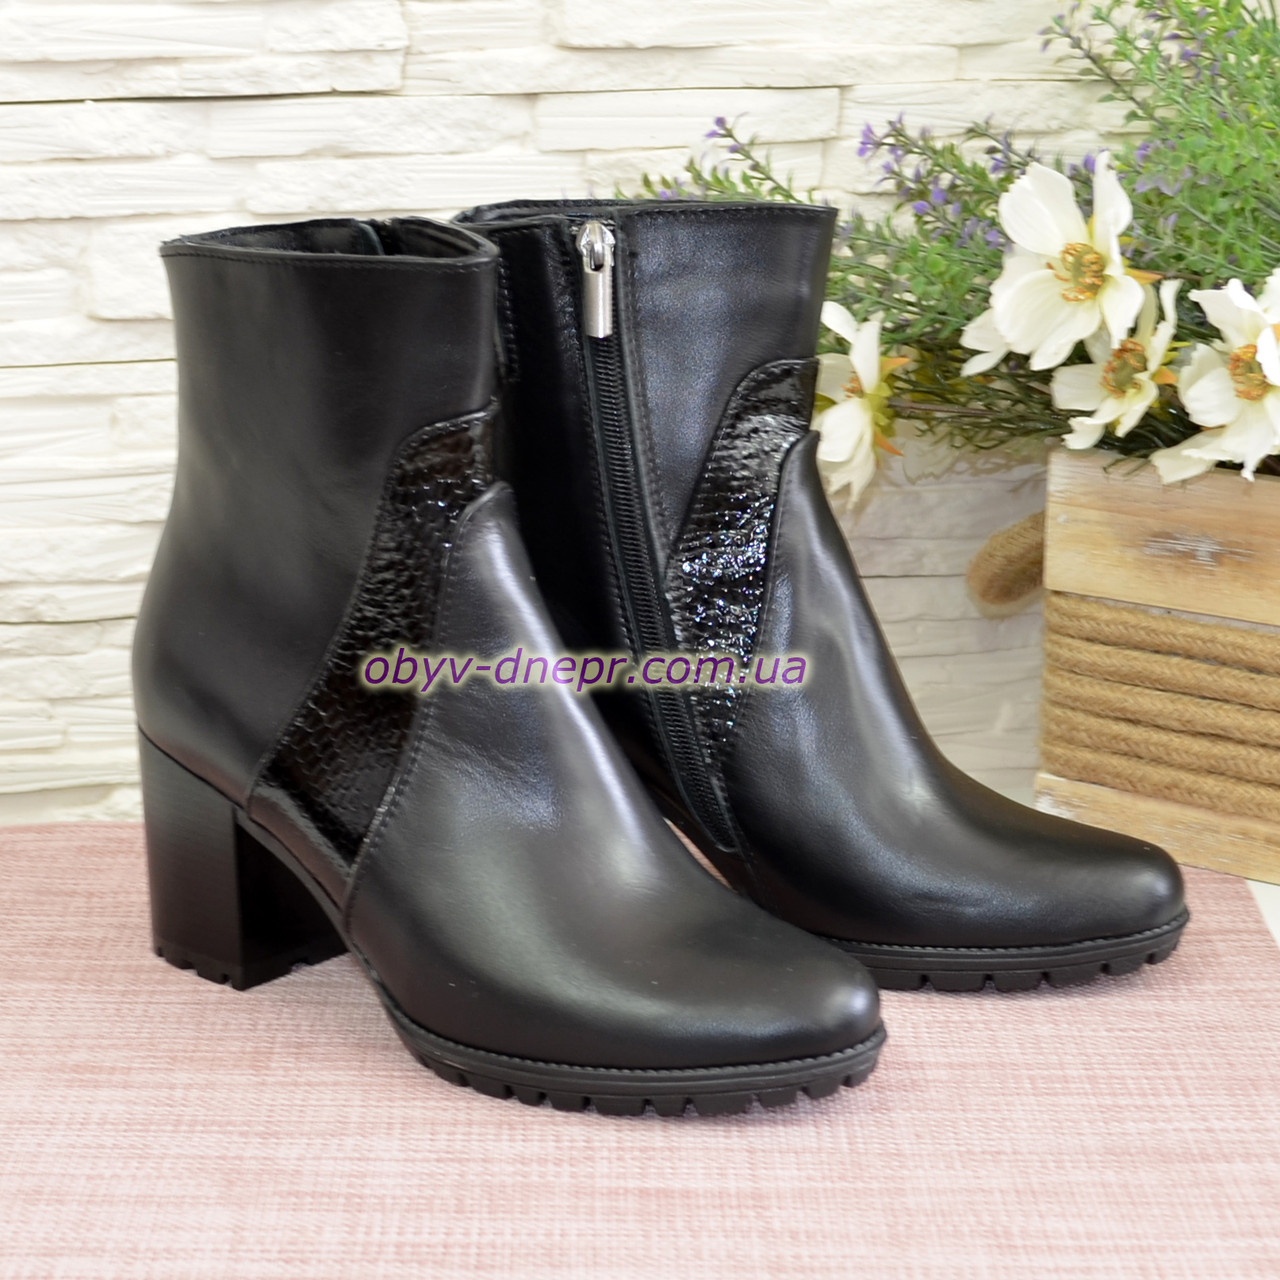 Ботинки женские зимние на устойчивом каблуке